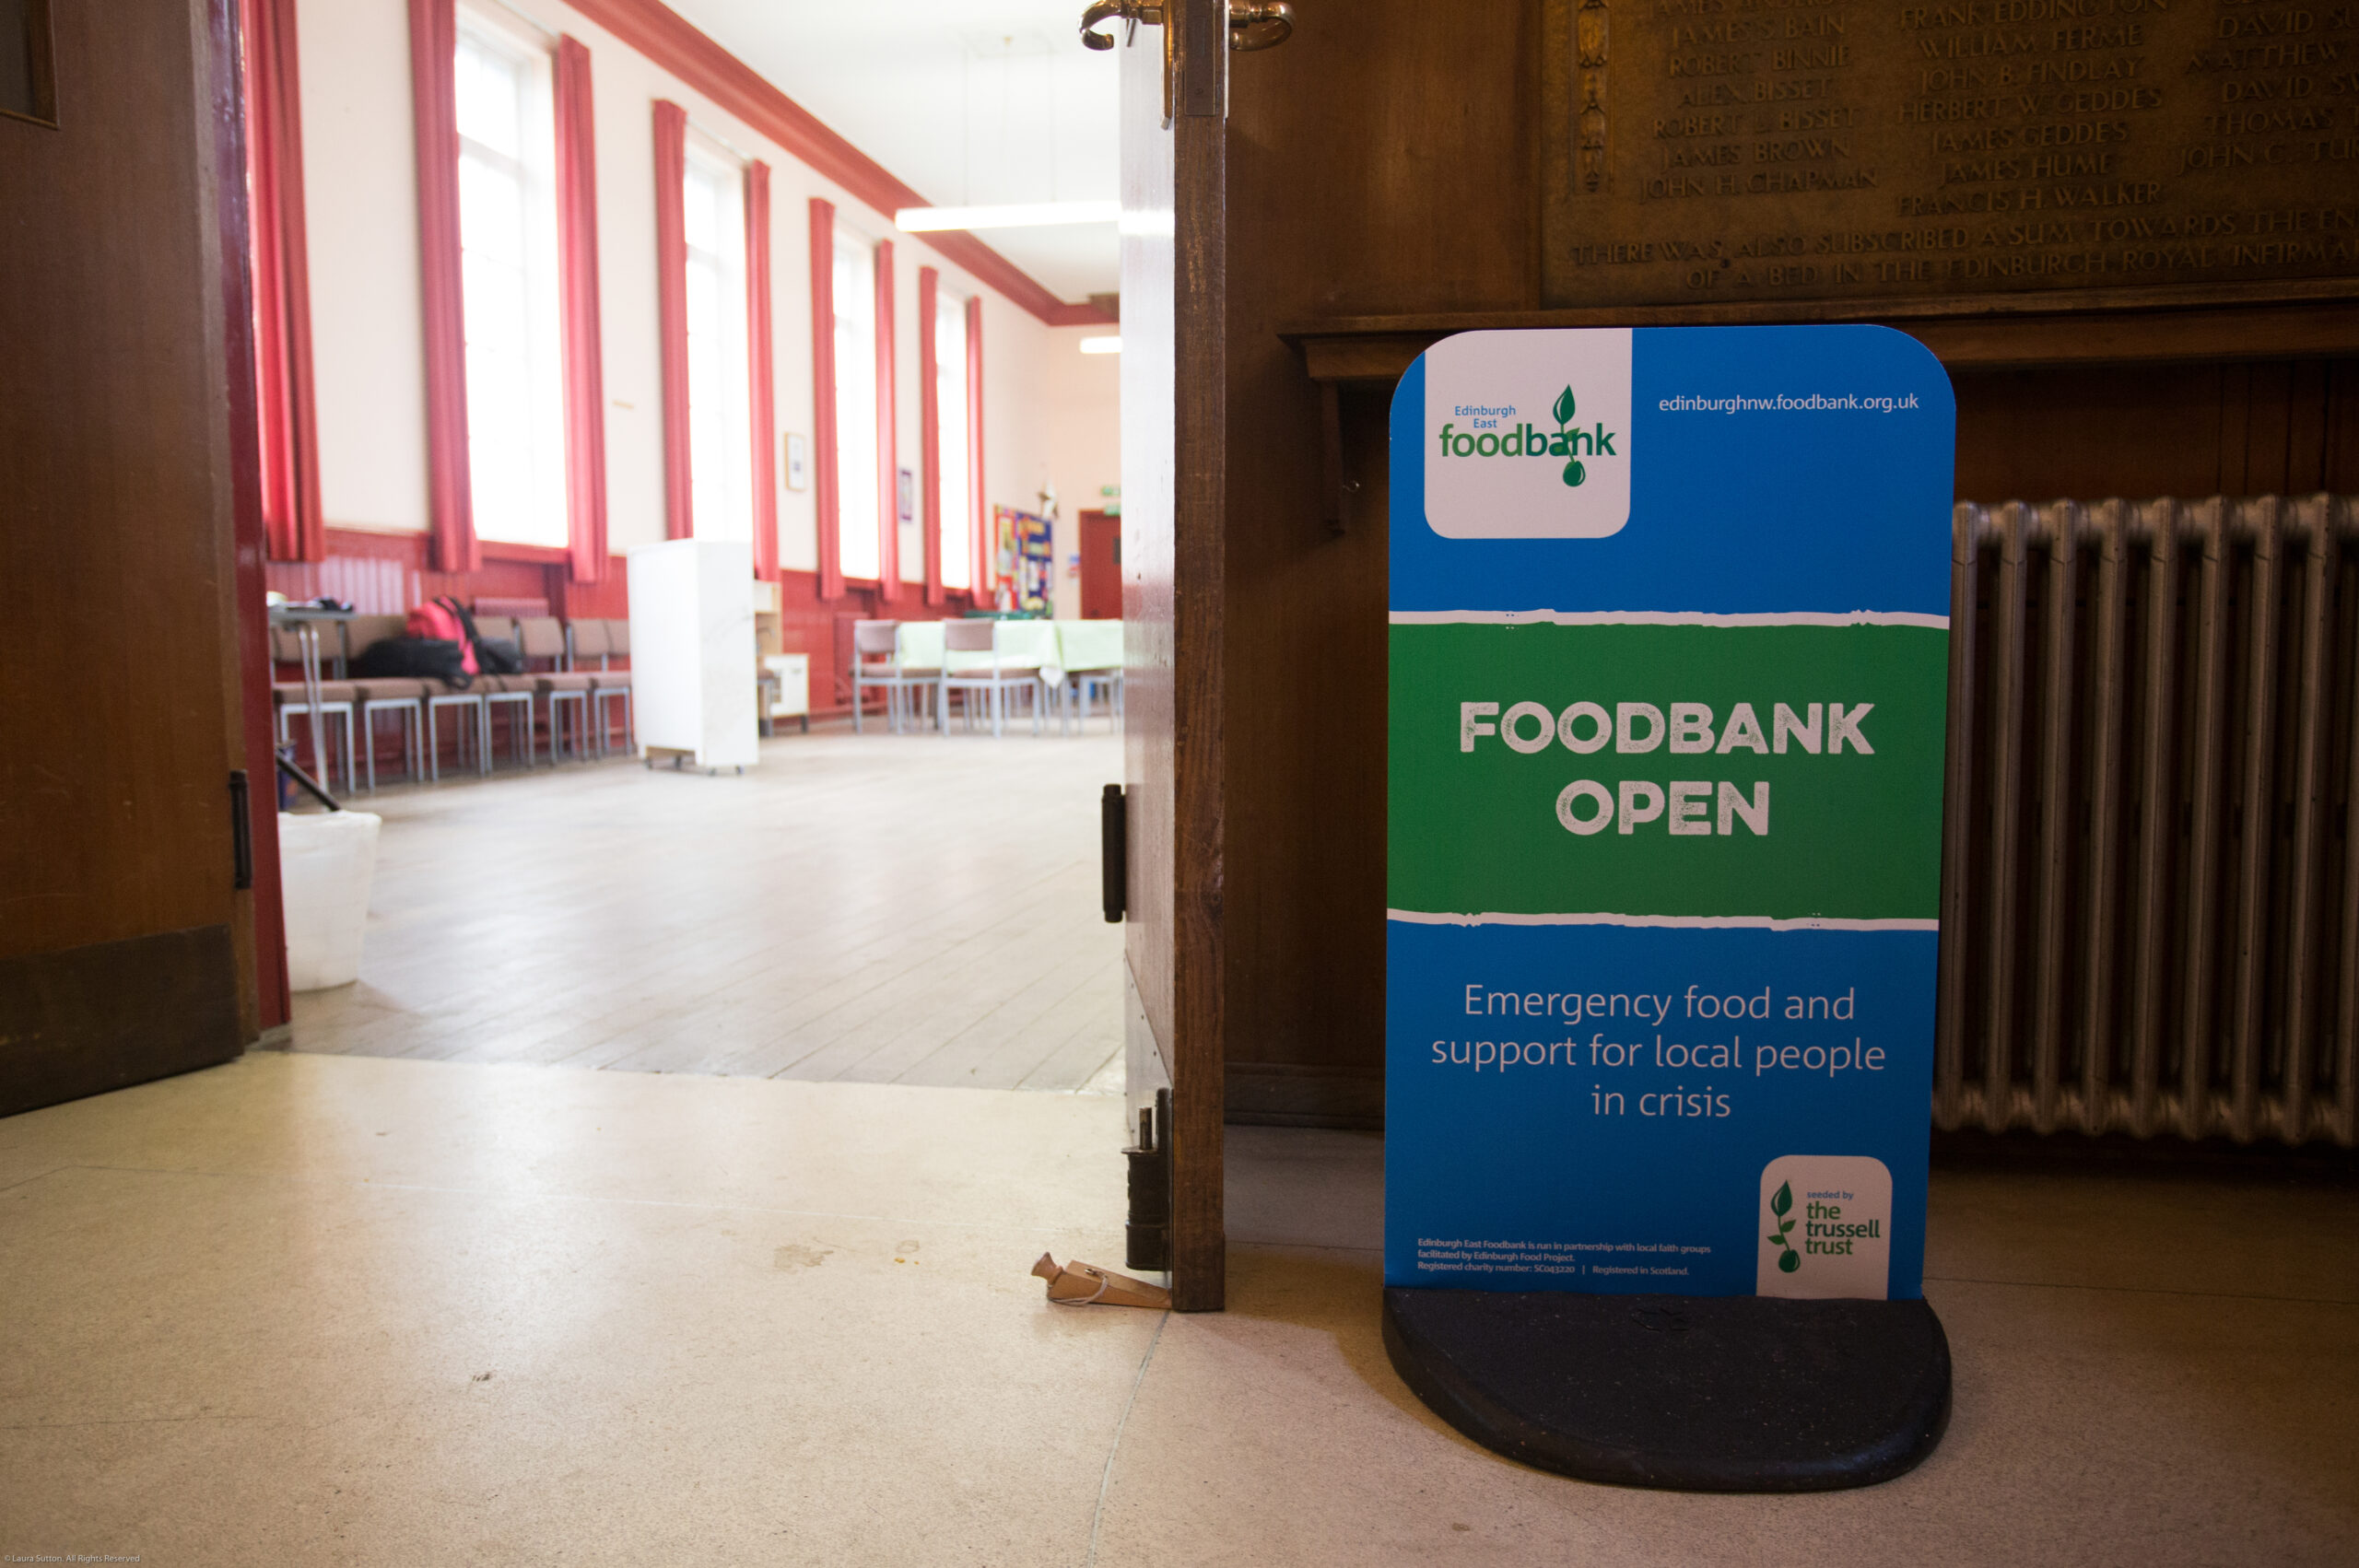 Environmental shot of foodbank collection point